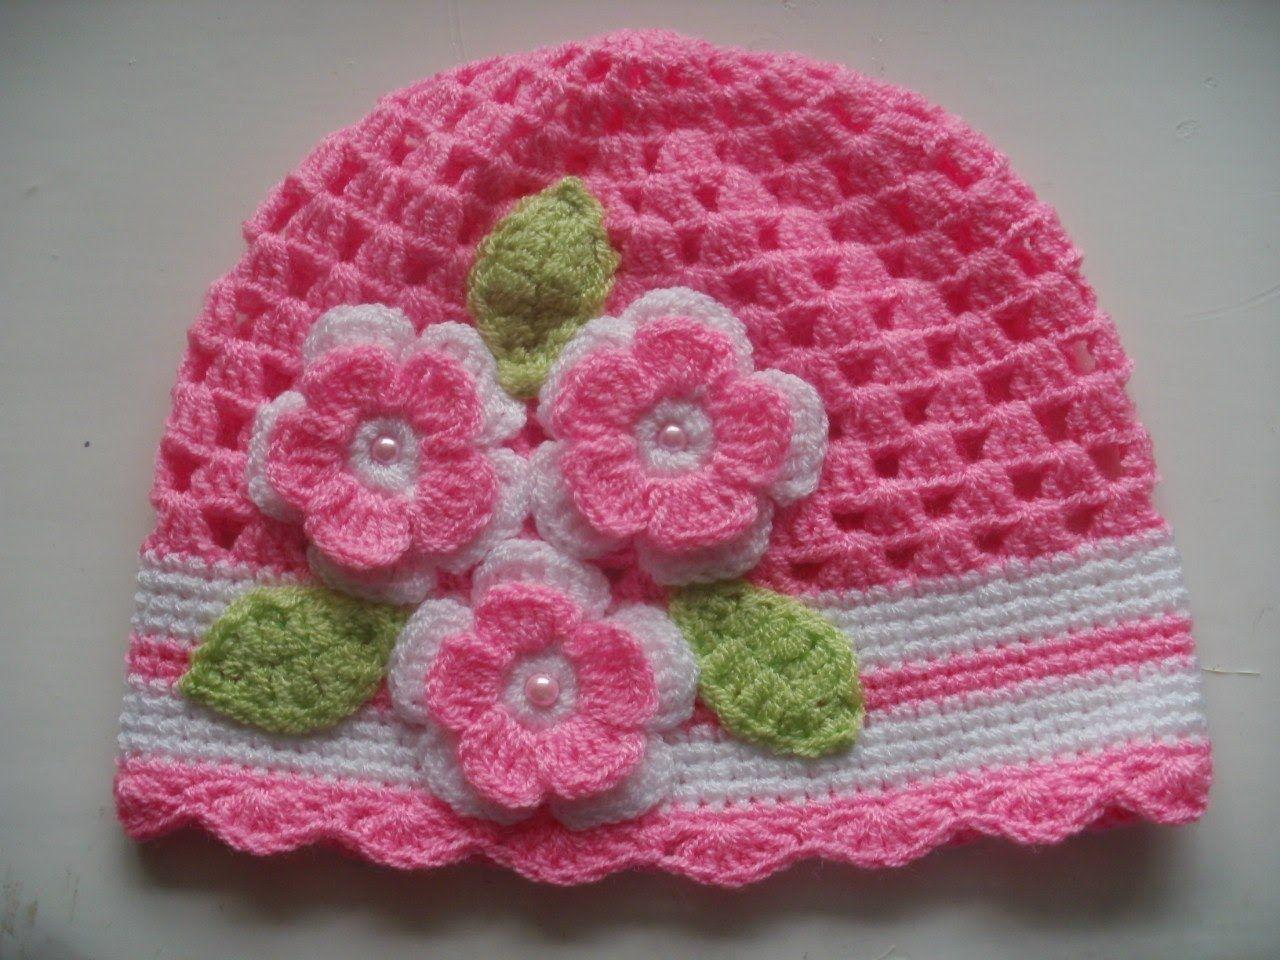 Gorro Tejidos A Crochet Para Bebe De Verano Gorros Tejidos A